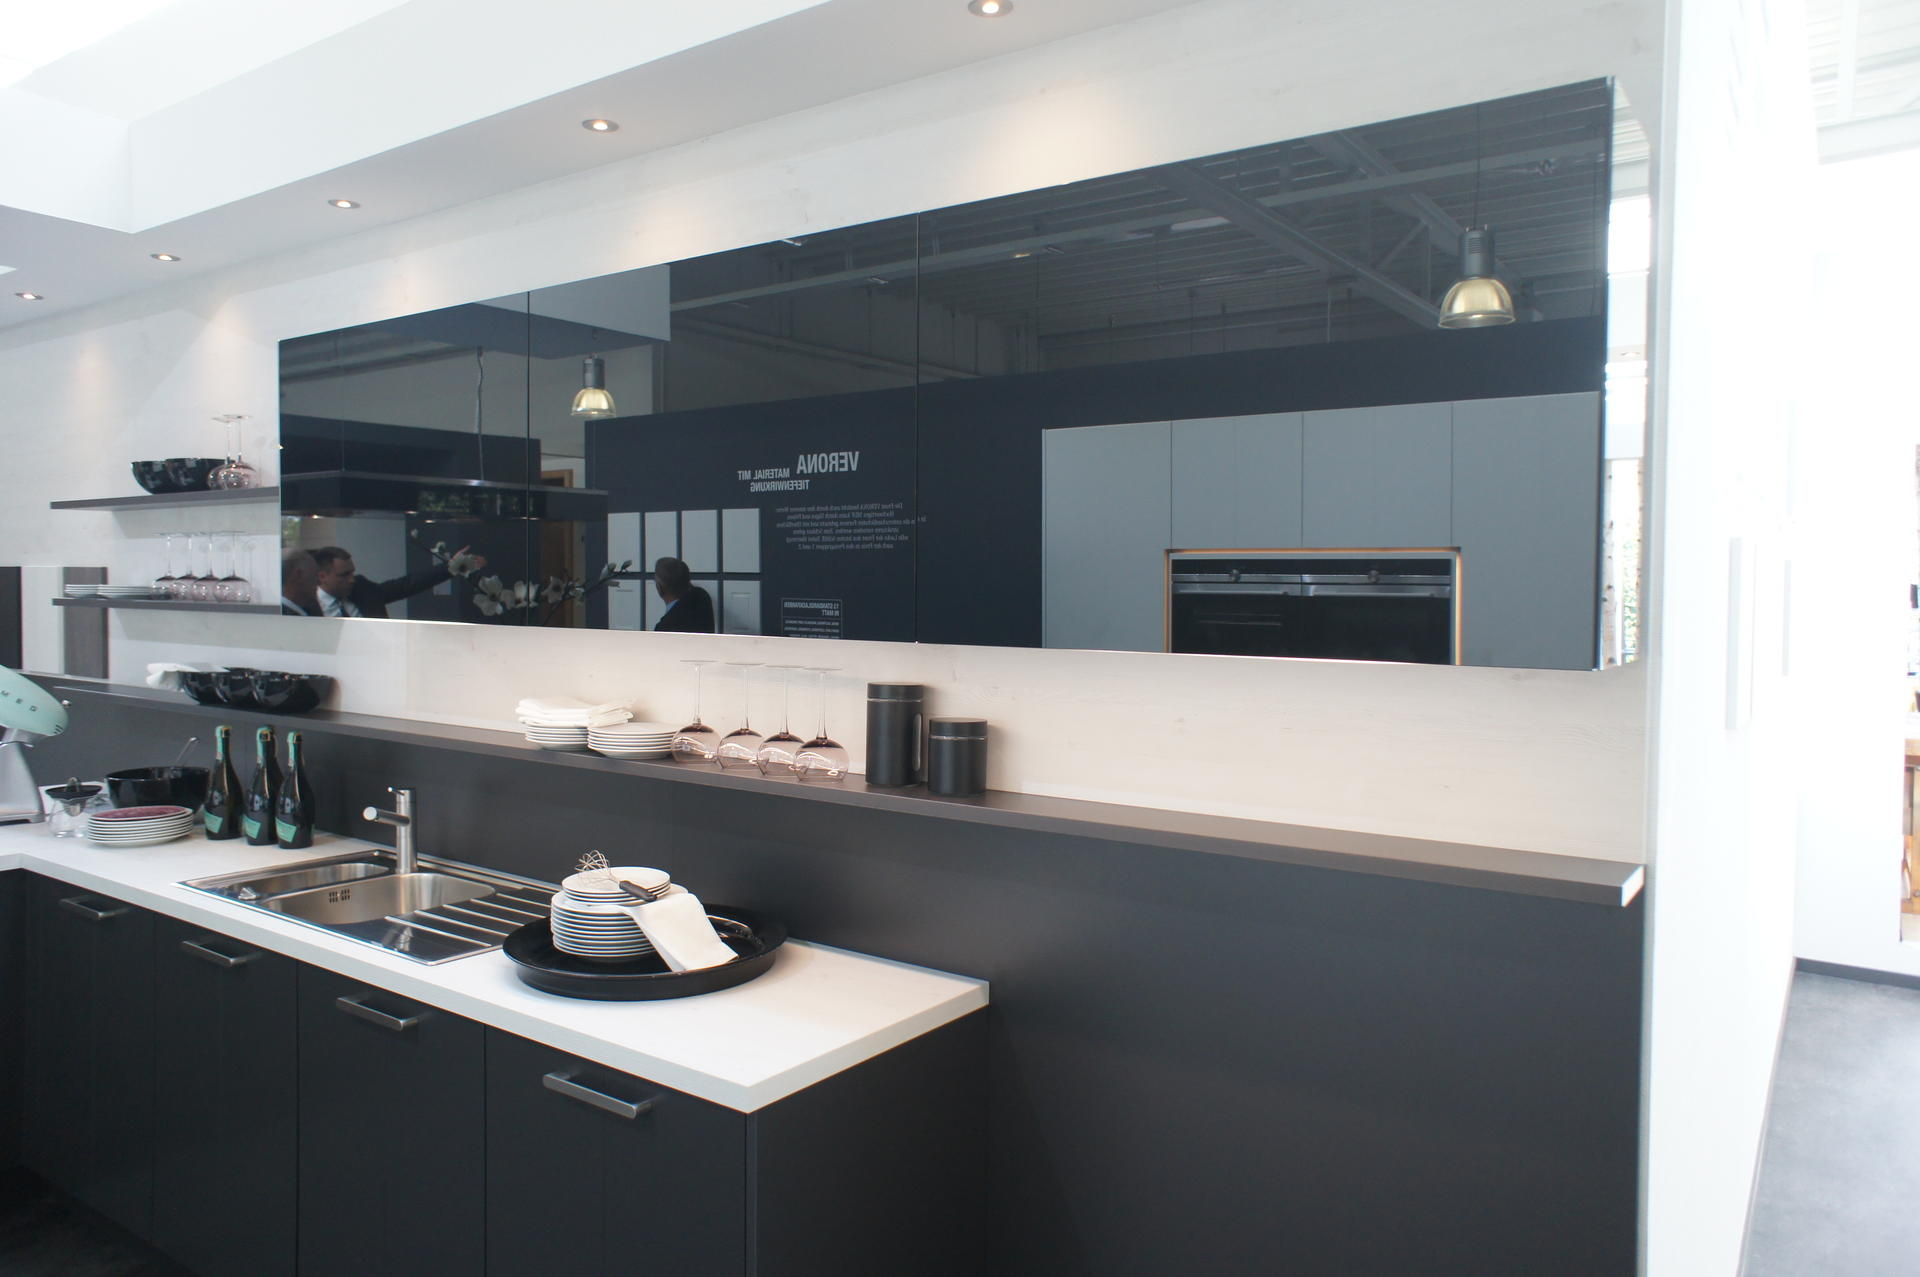 Кухня Nieburg VERONA | VERMONT фото 3